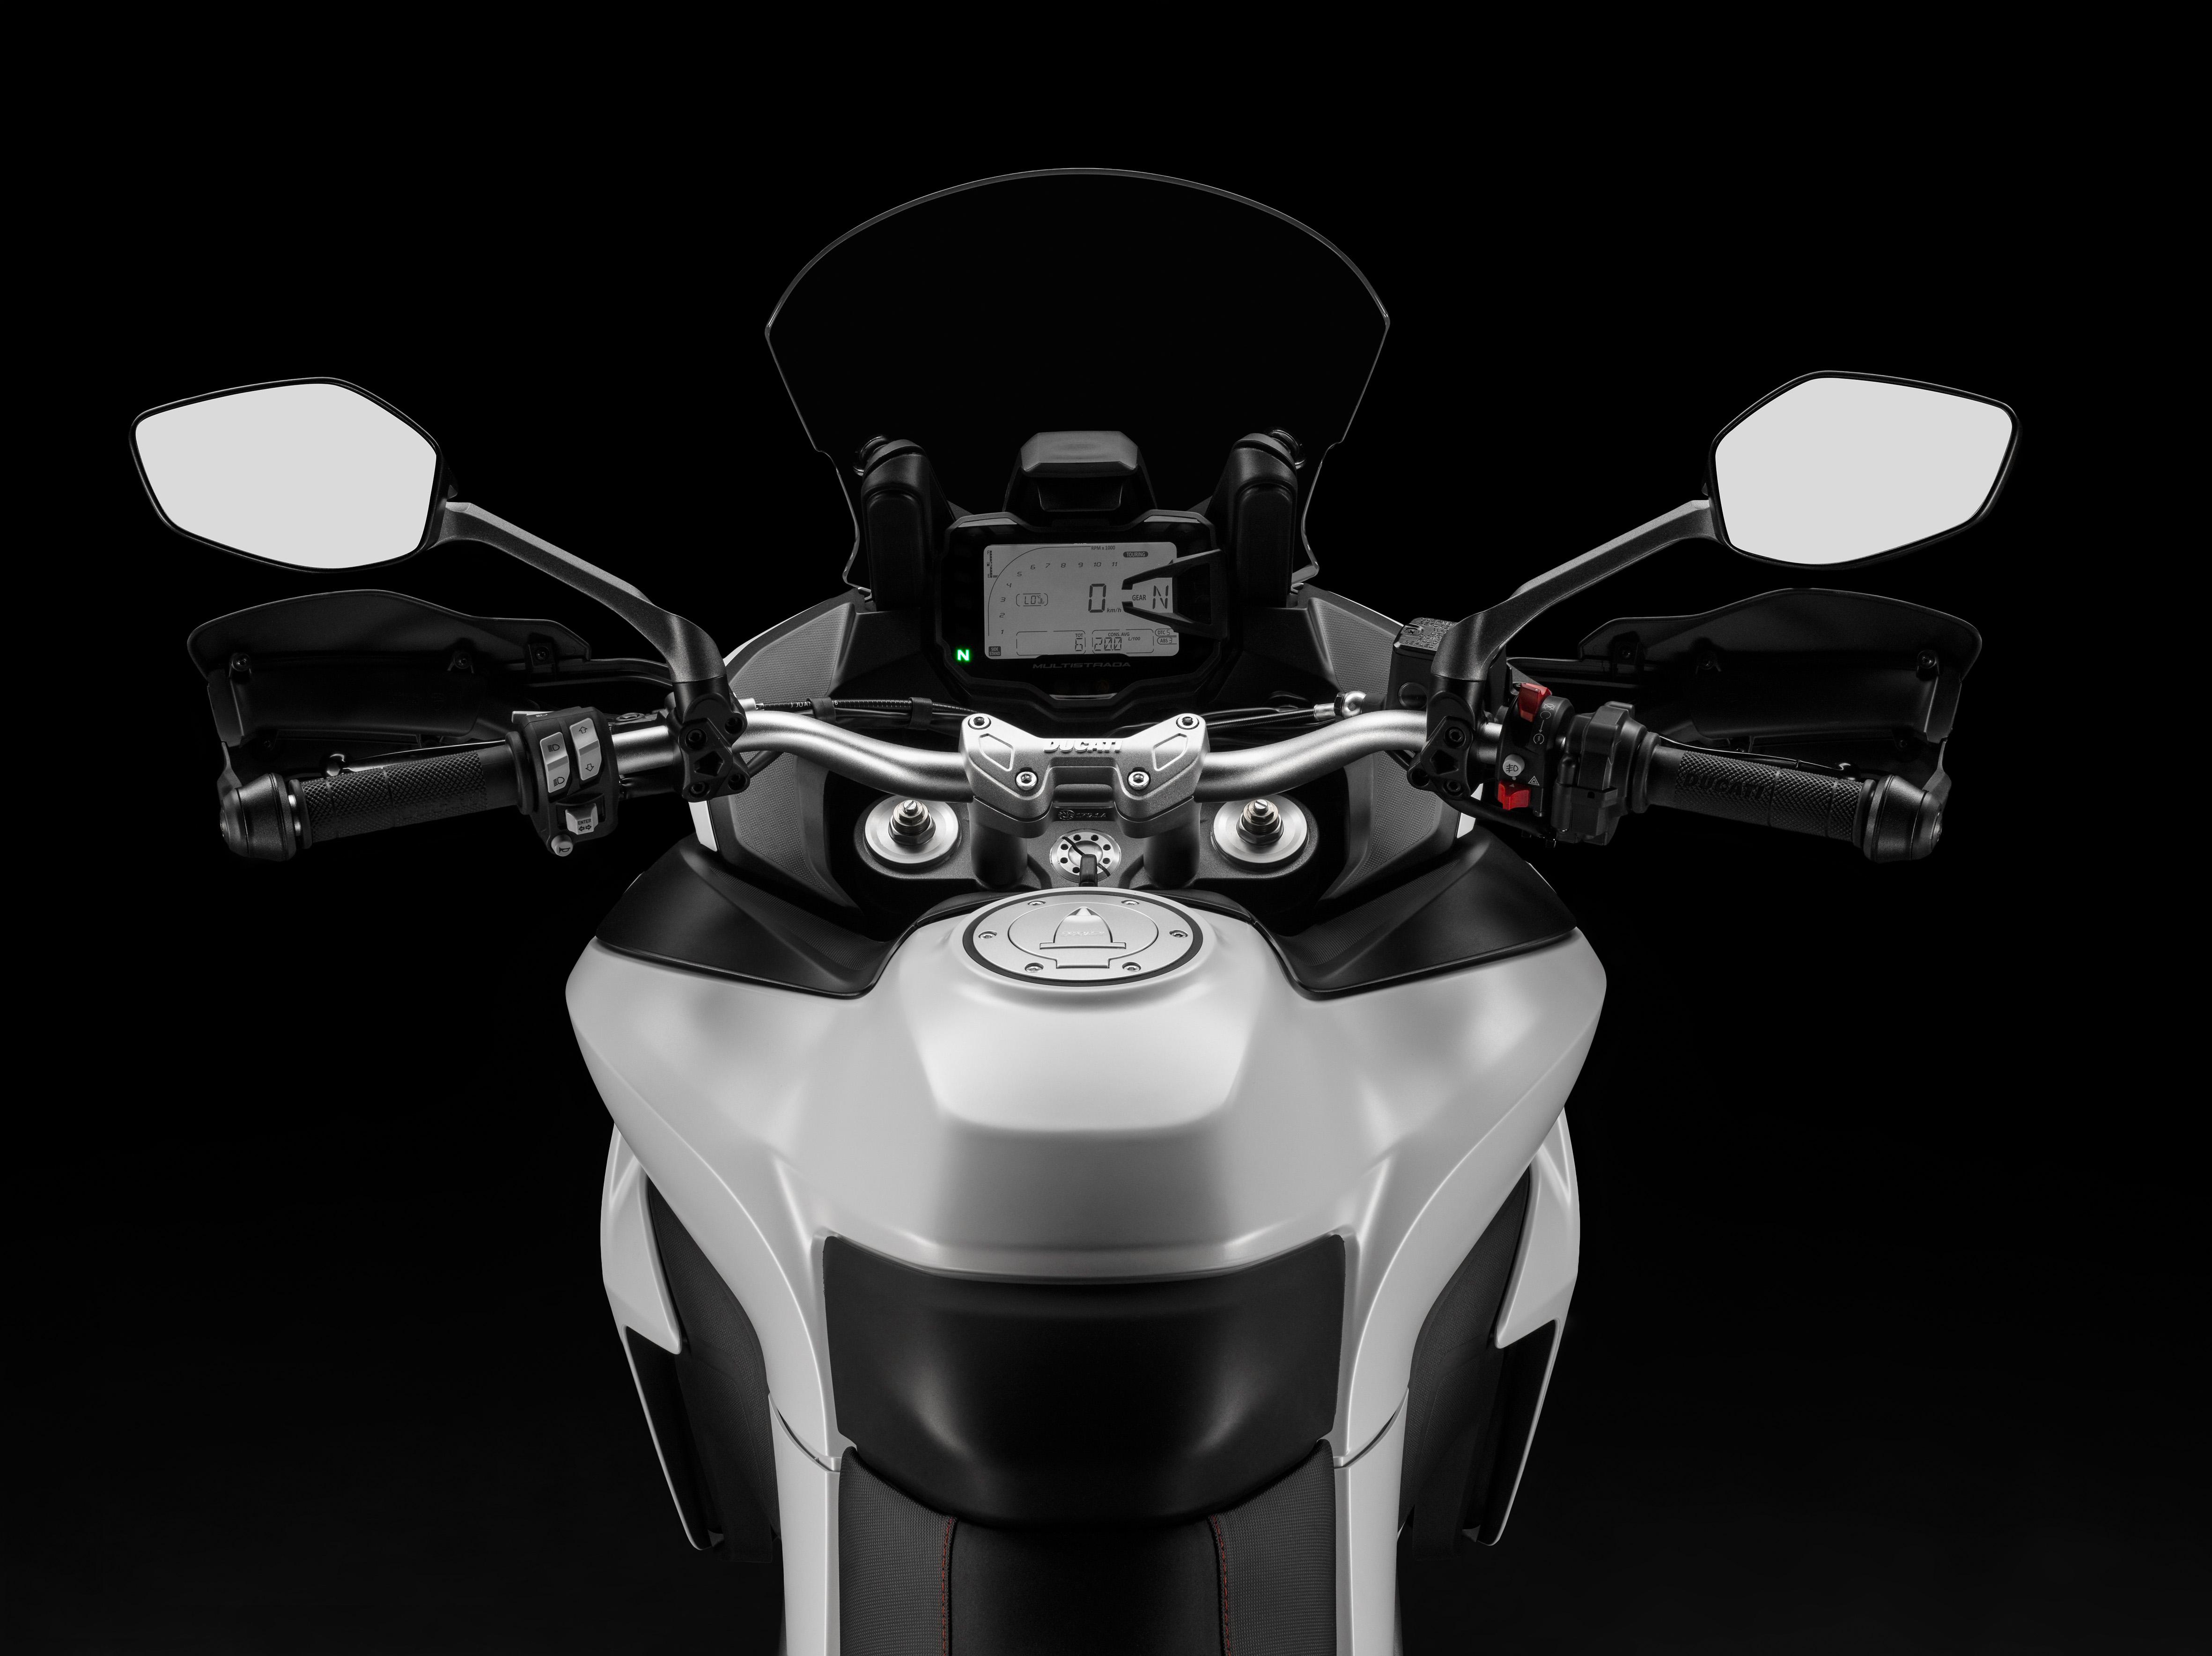 Ducati MULTISTRADA 950 Dash